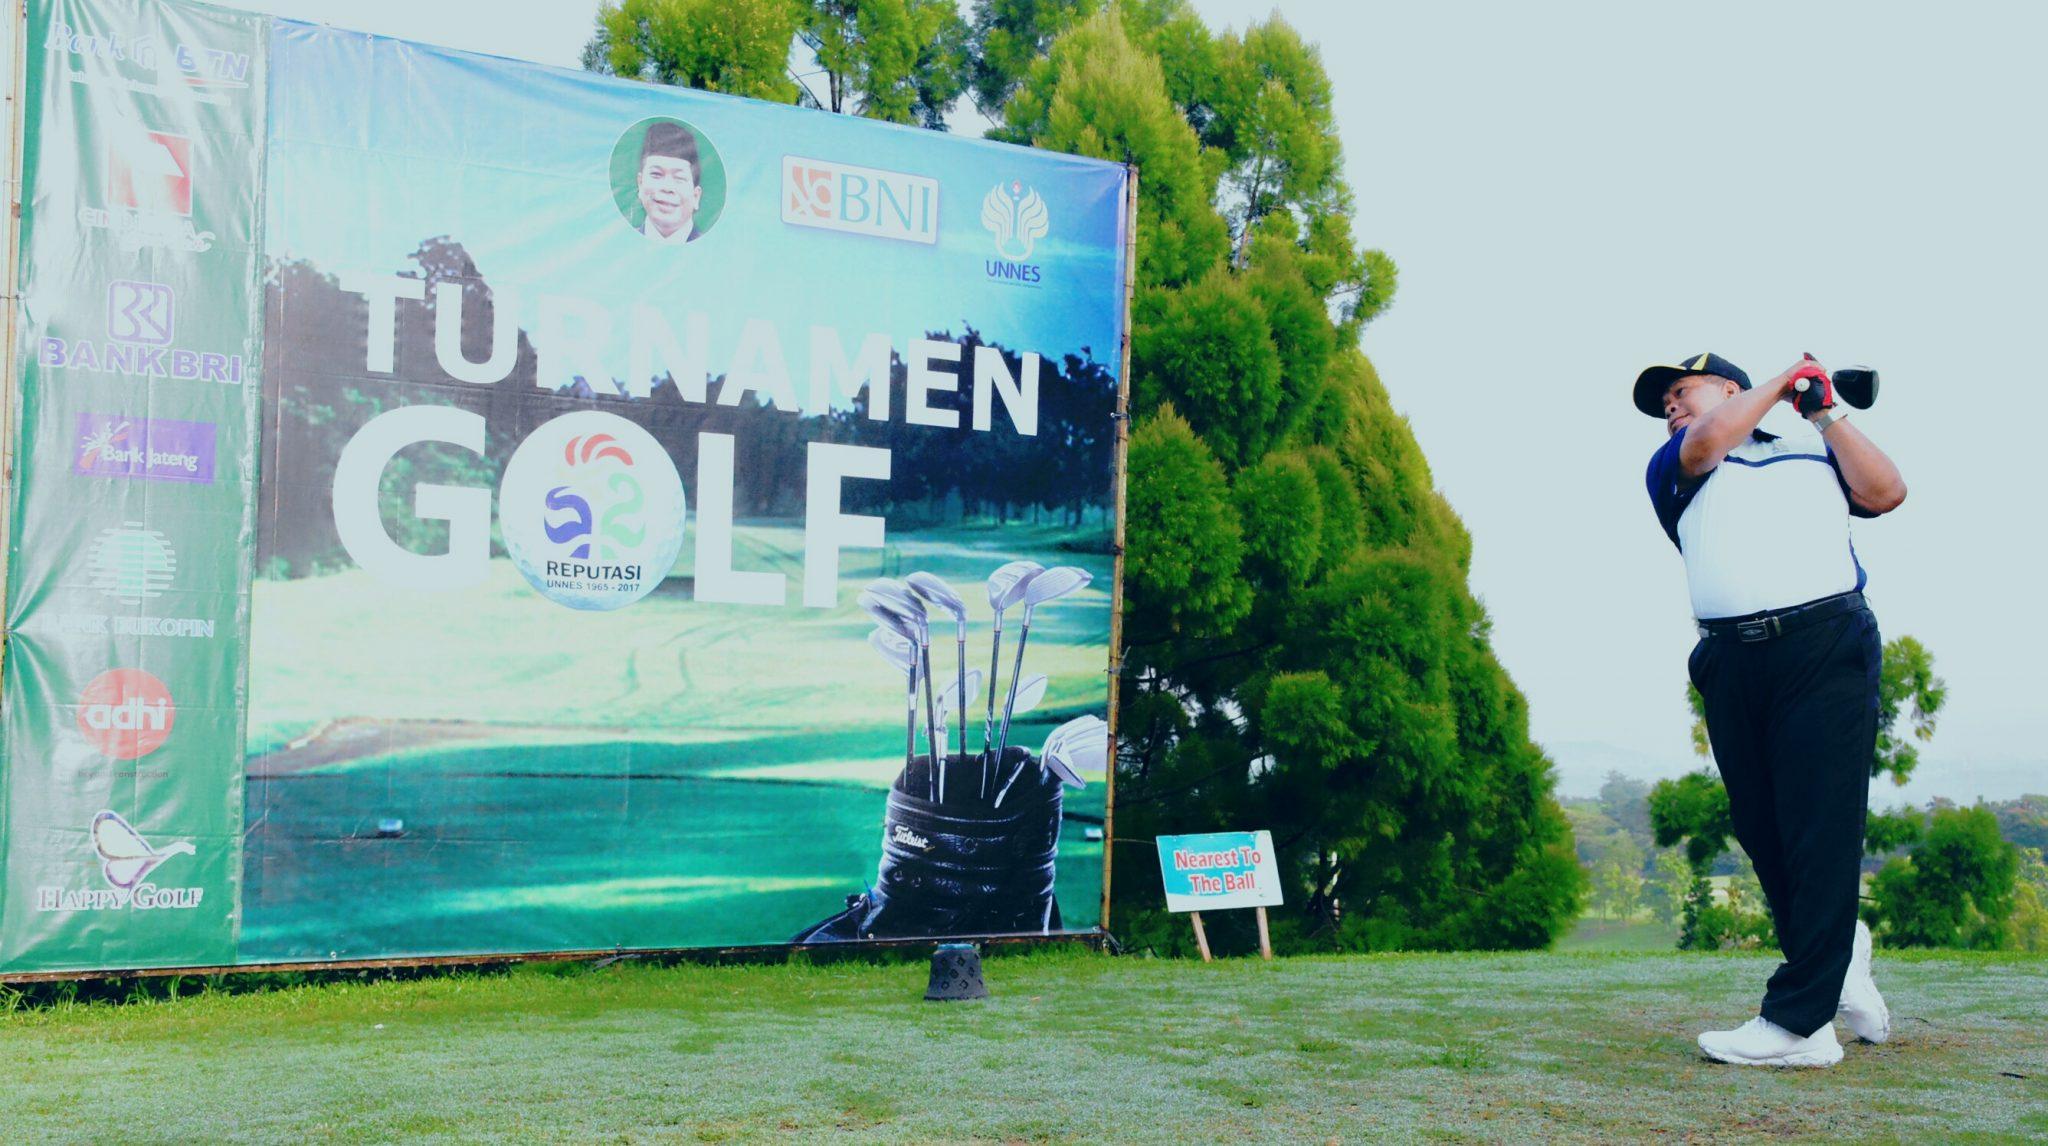 Turnament Golf UNNES Kembali Digelar Di Gombel Golf